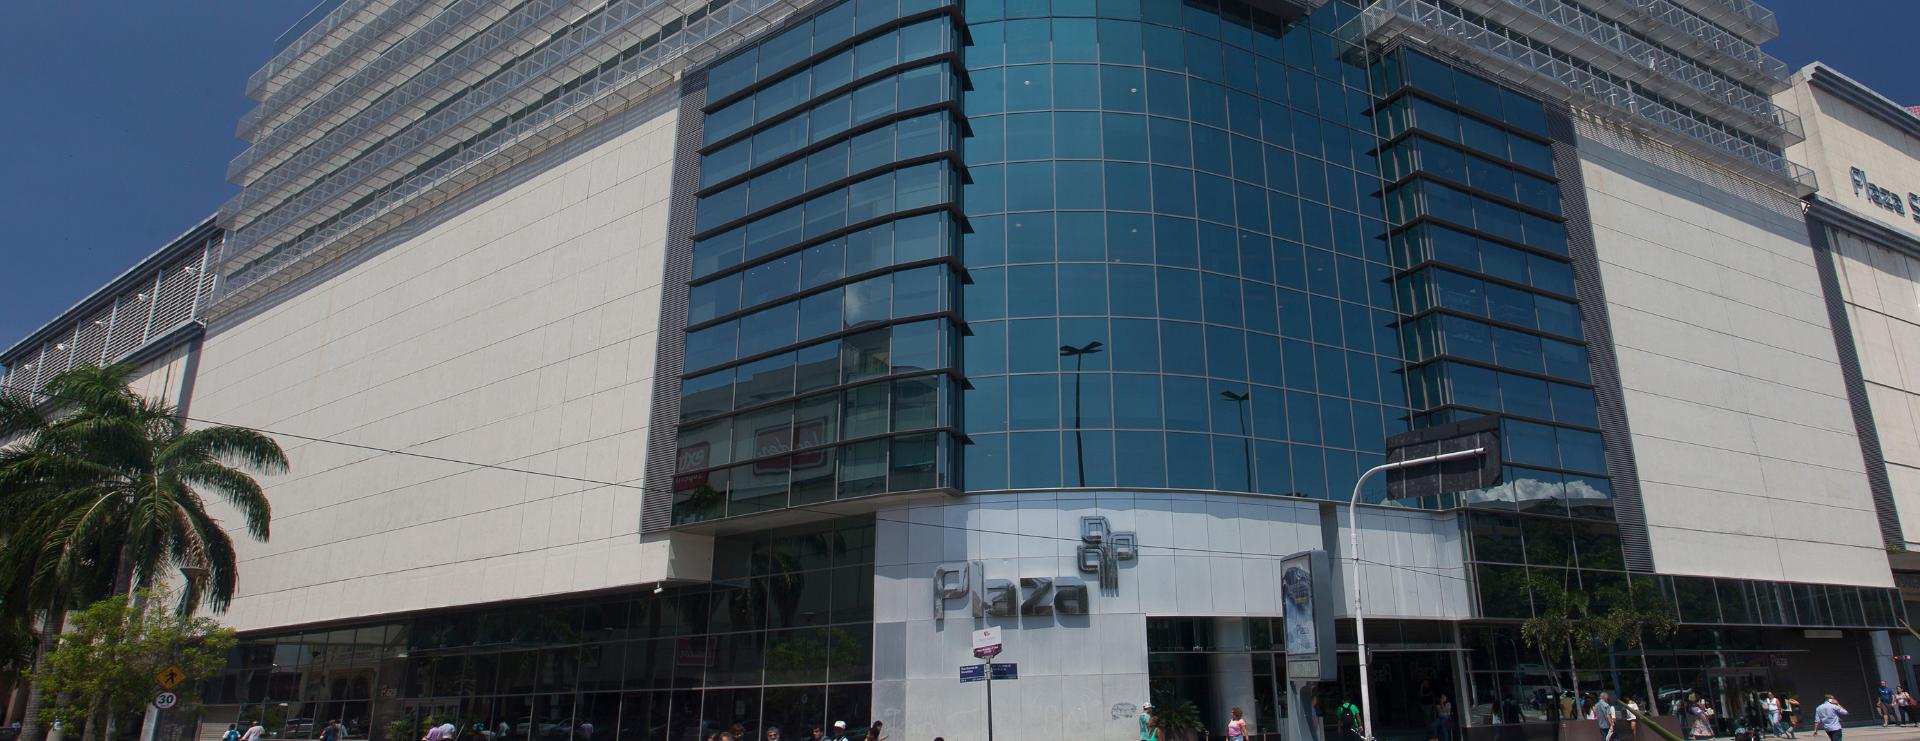 SALA COMERCIAL COM 197 m2- PLAZA CORPORATE  & OFFICES